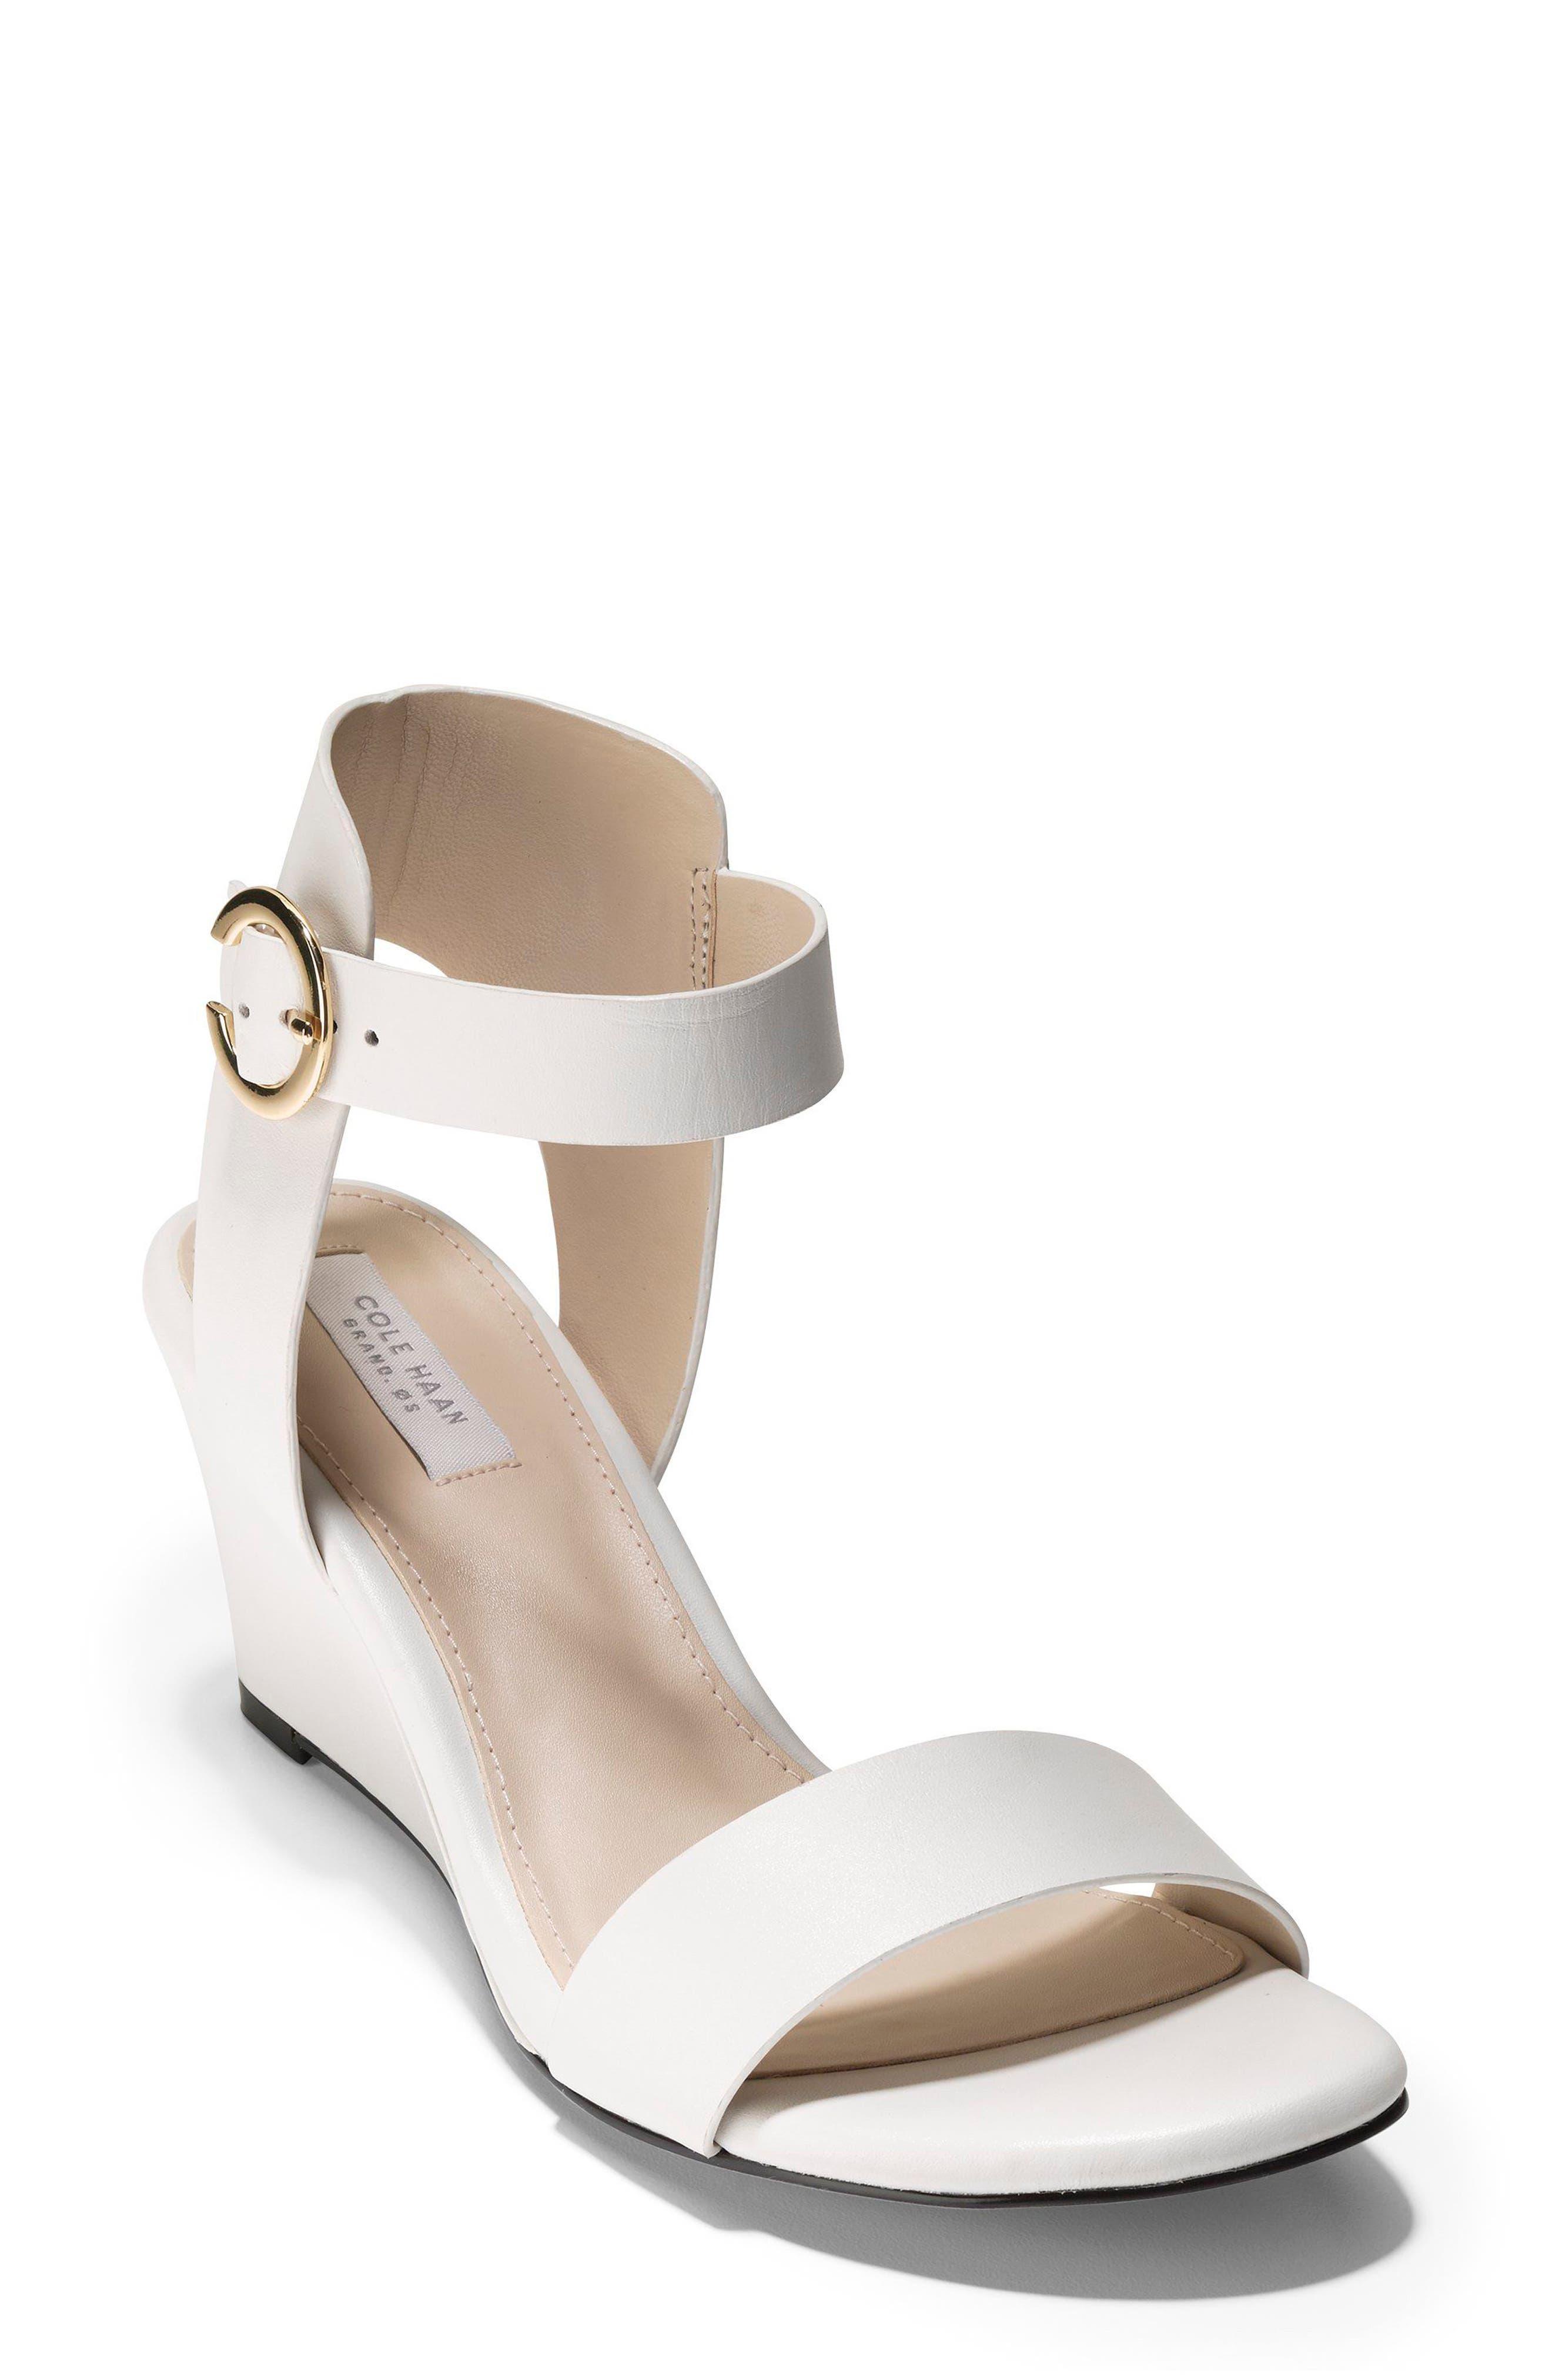 Rosalind Wedge Sandal,                         Main,                         color,